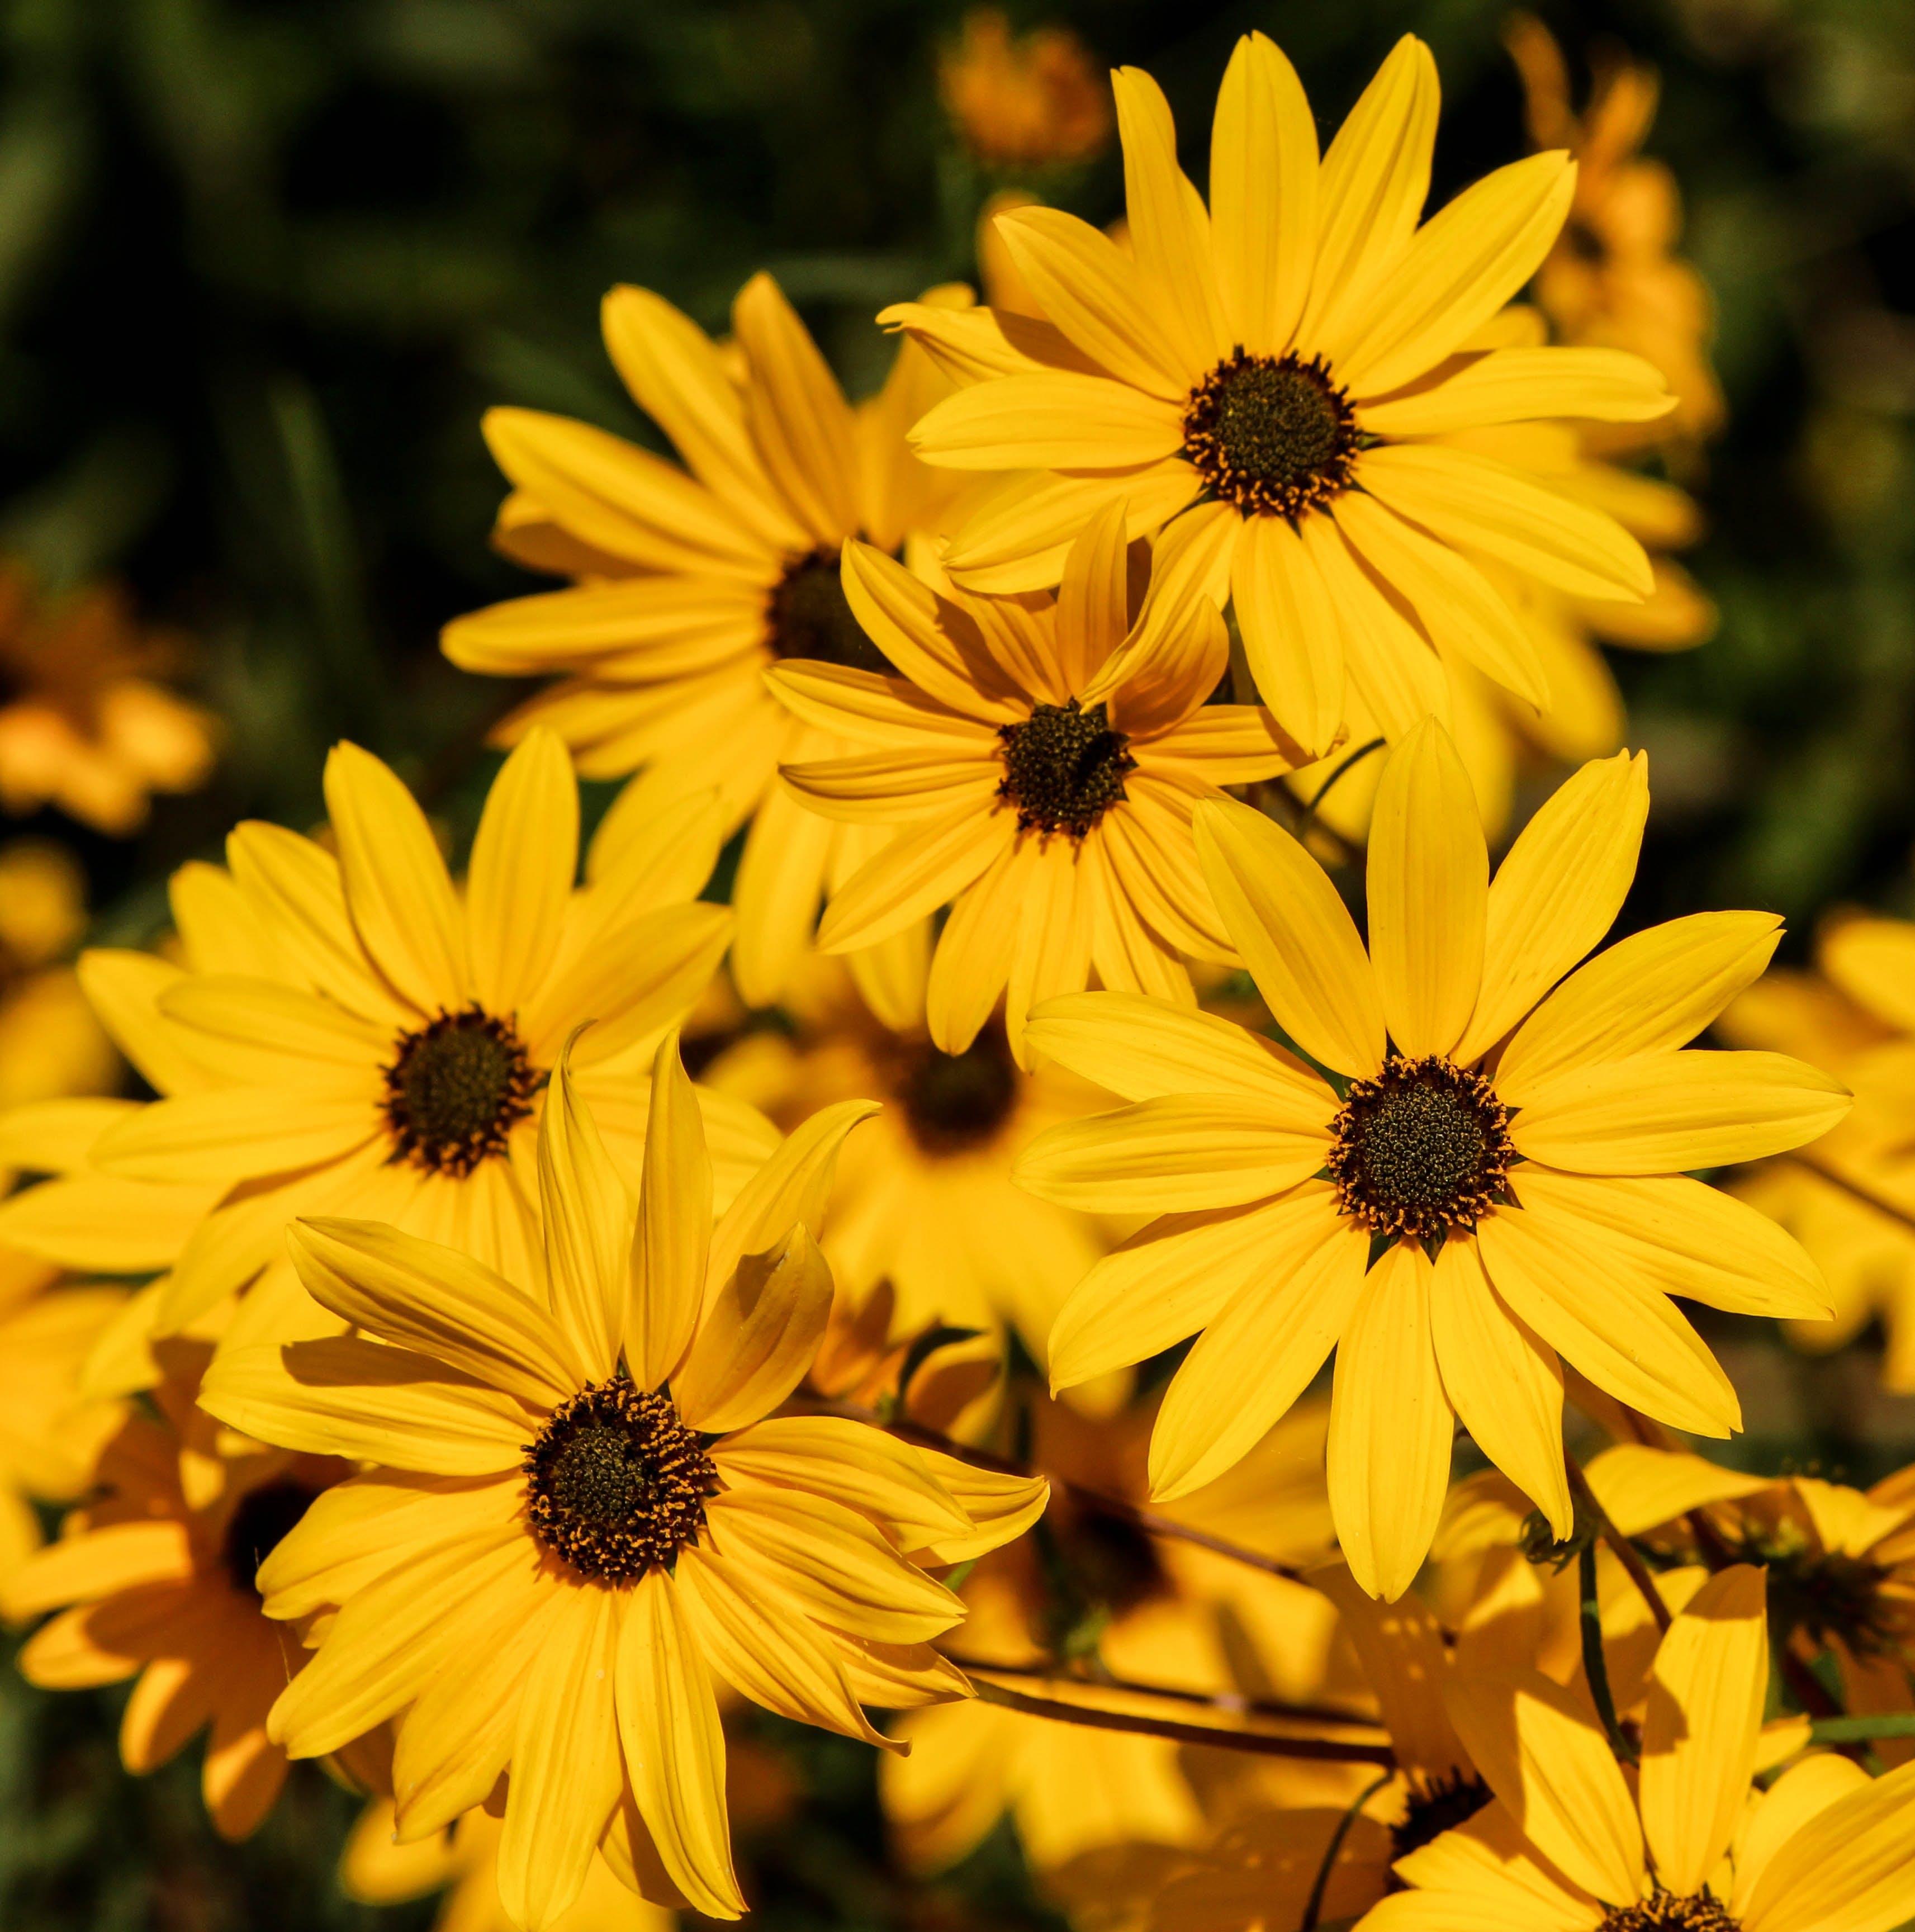 Yellow Daisies Tilt Shift Lens Photography